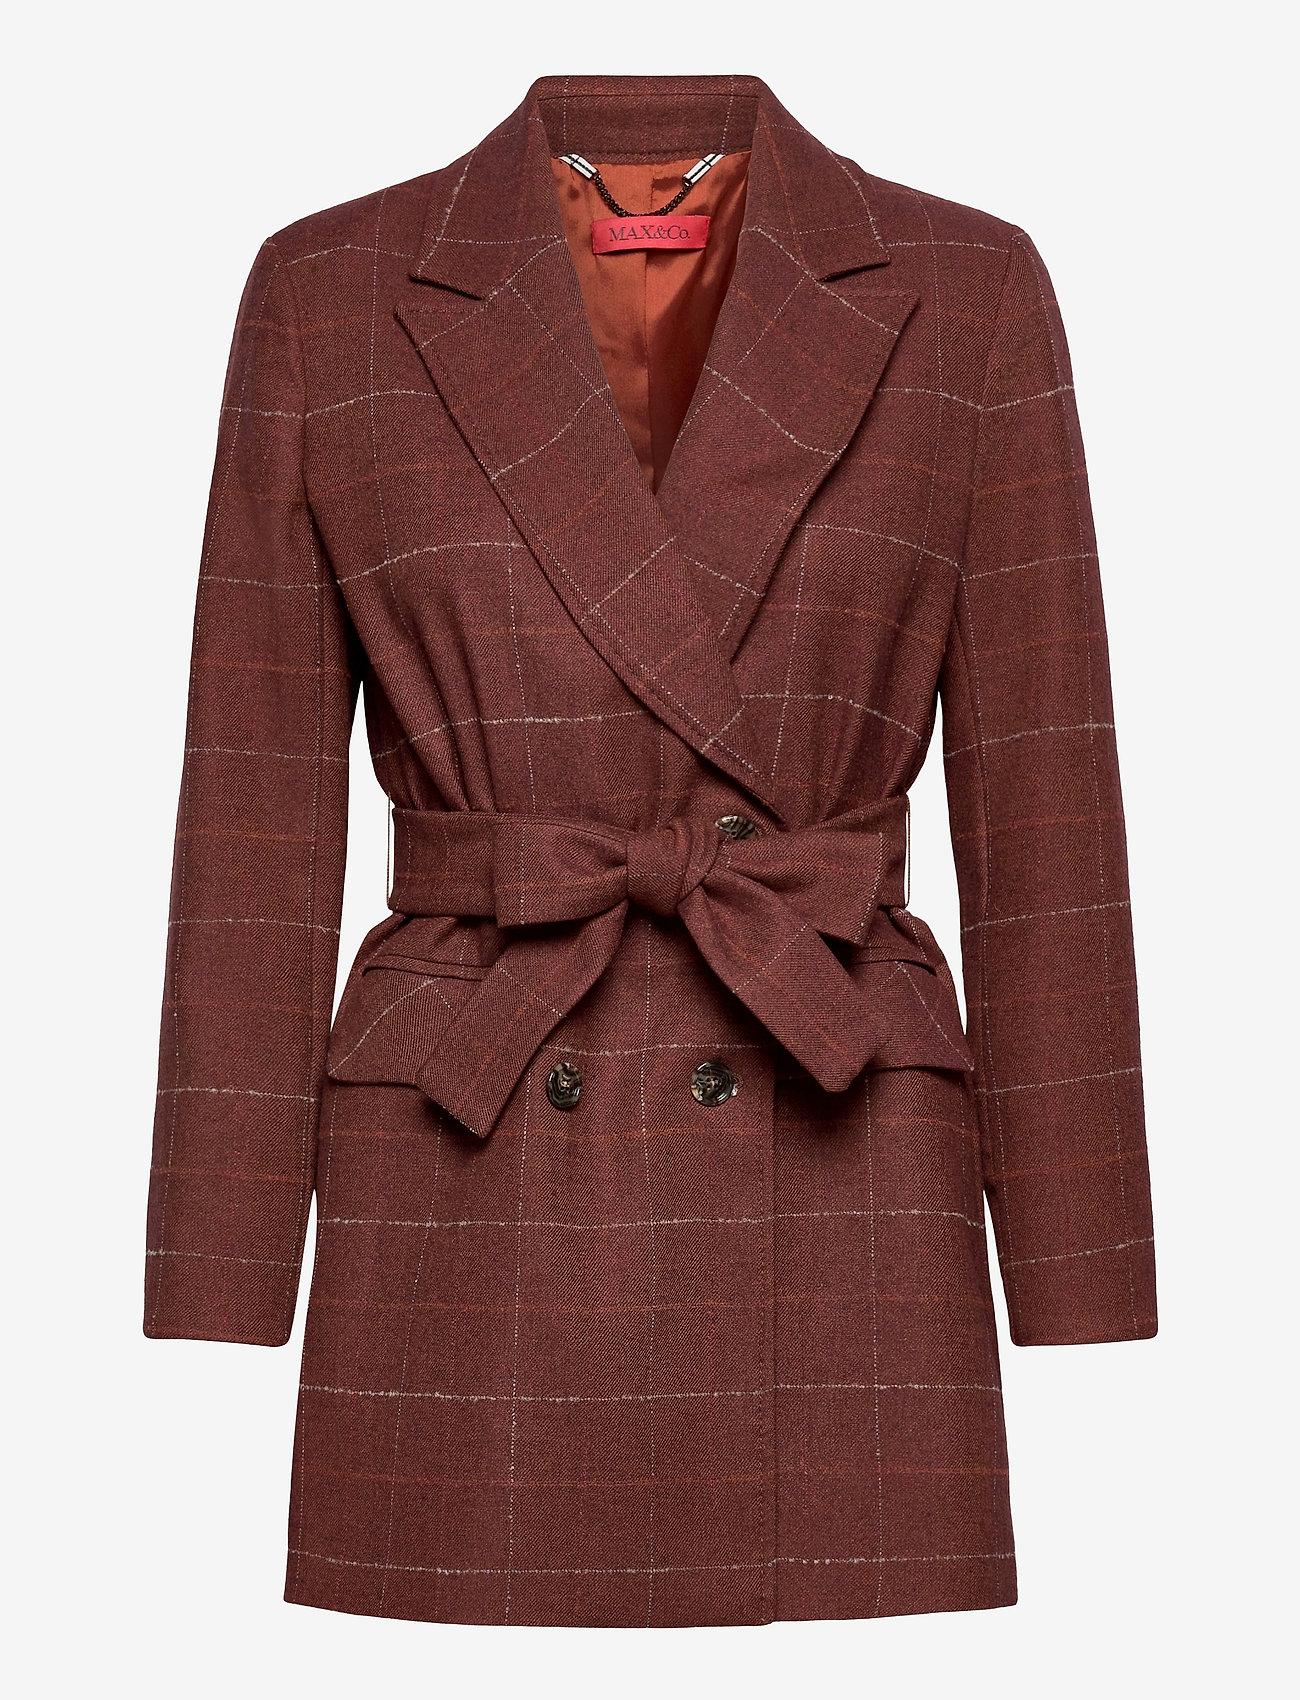 Max&Co. - GROSSETO - casual blazers - rust pattern - 0